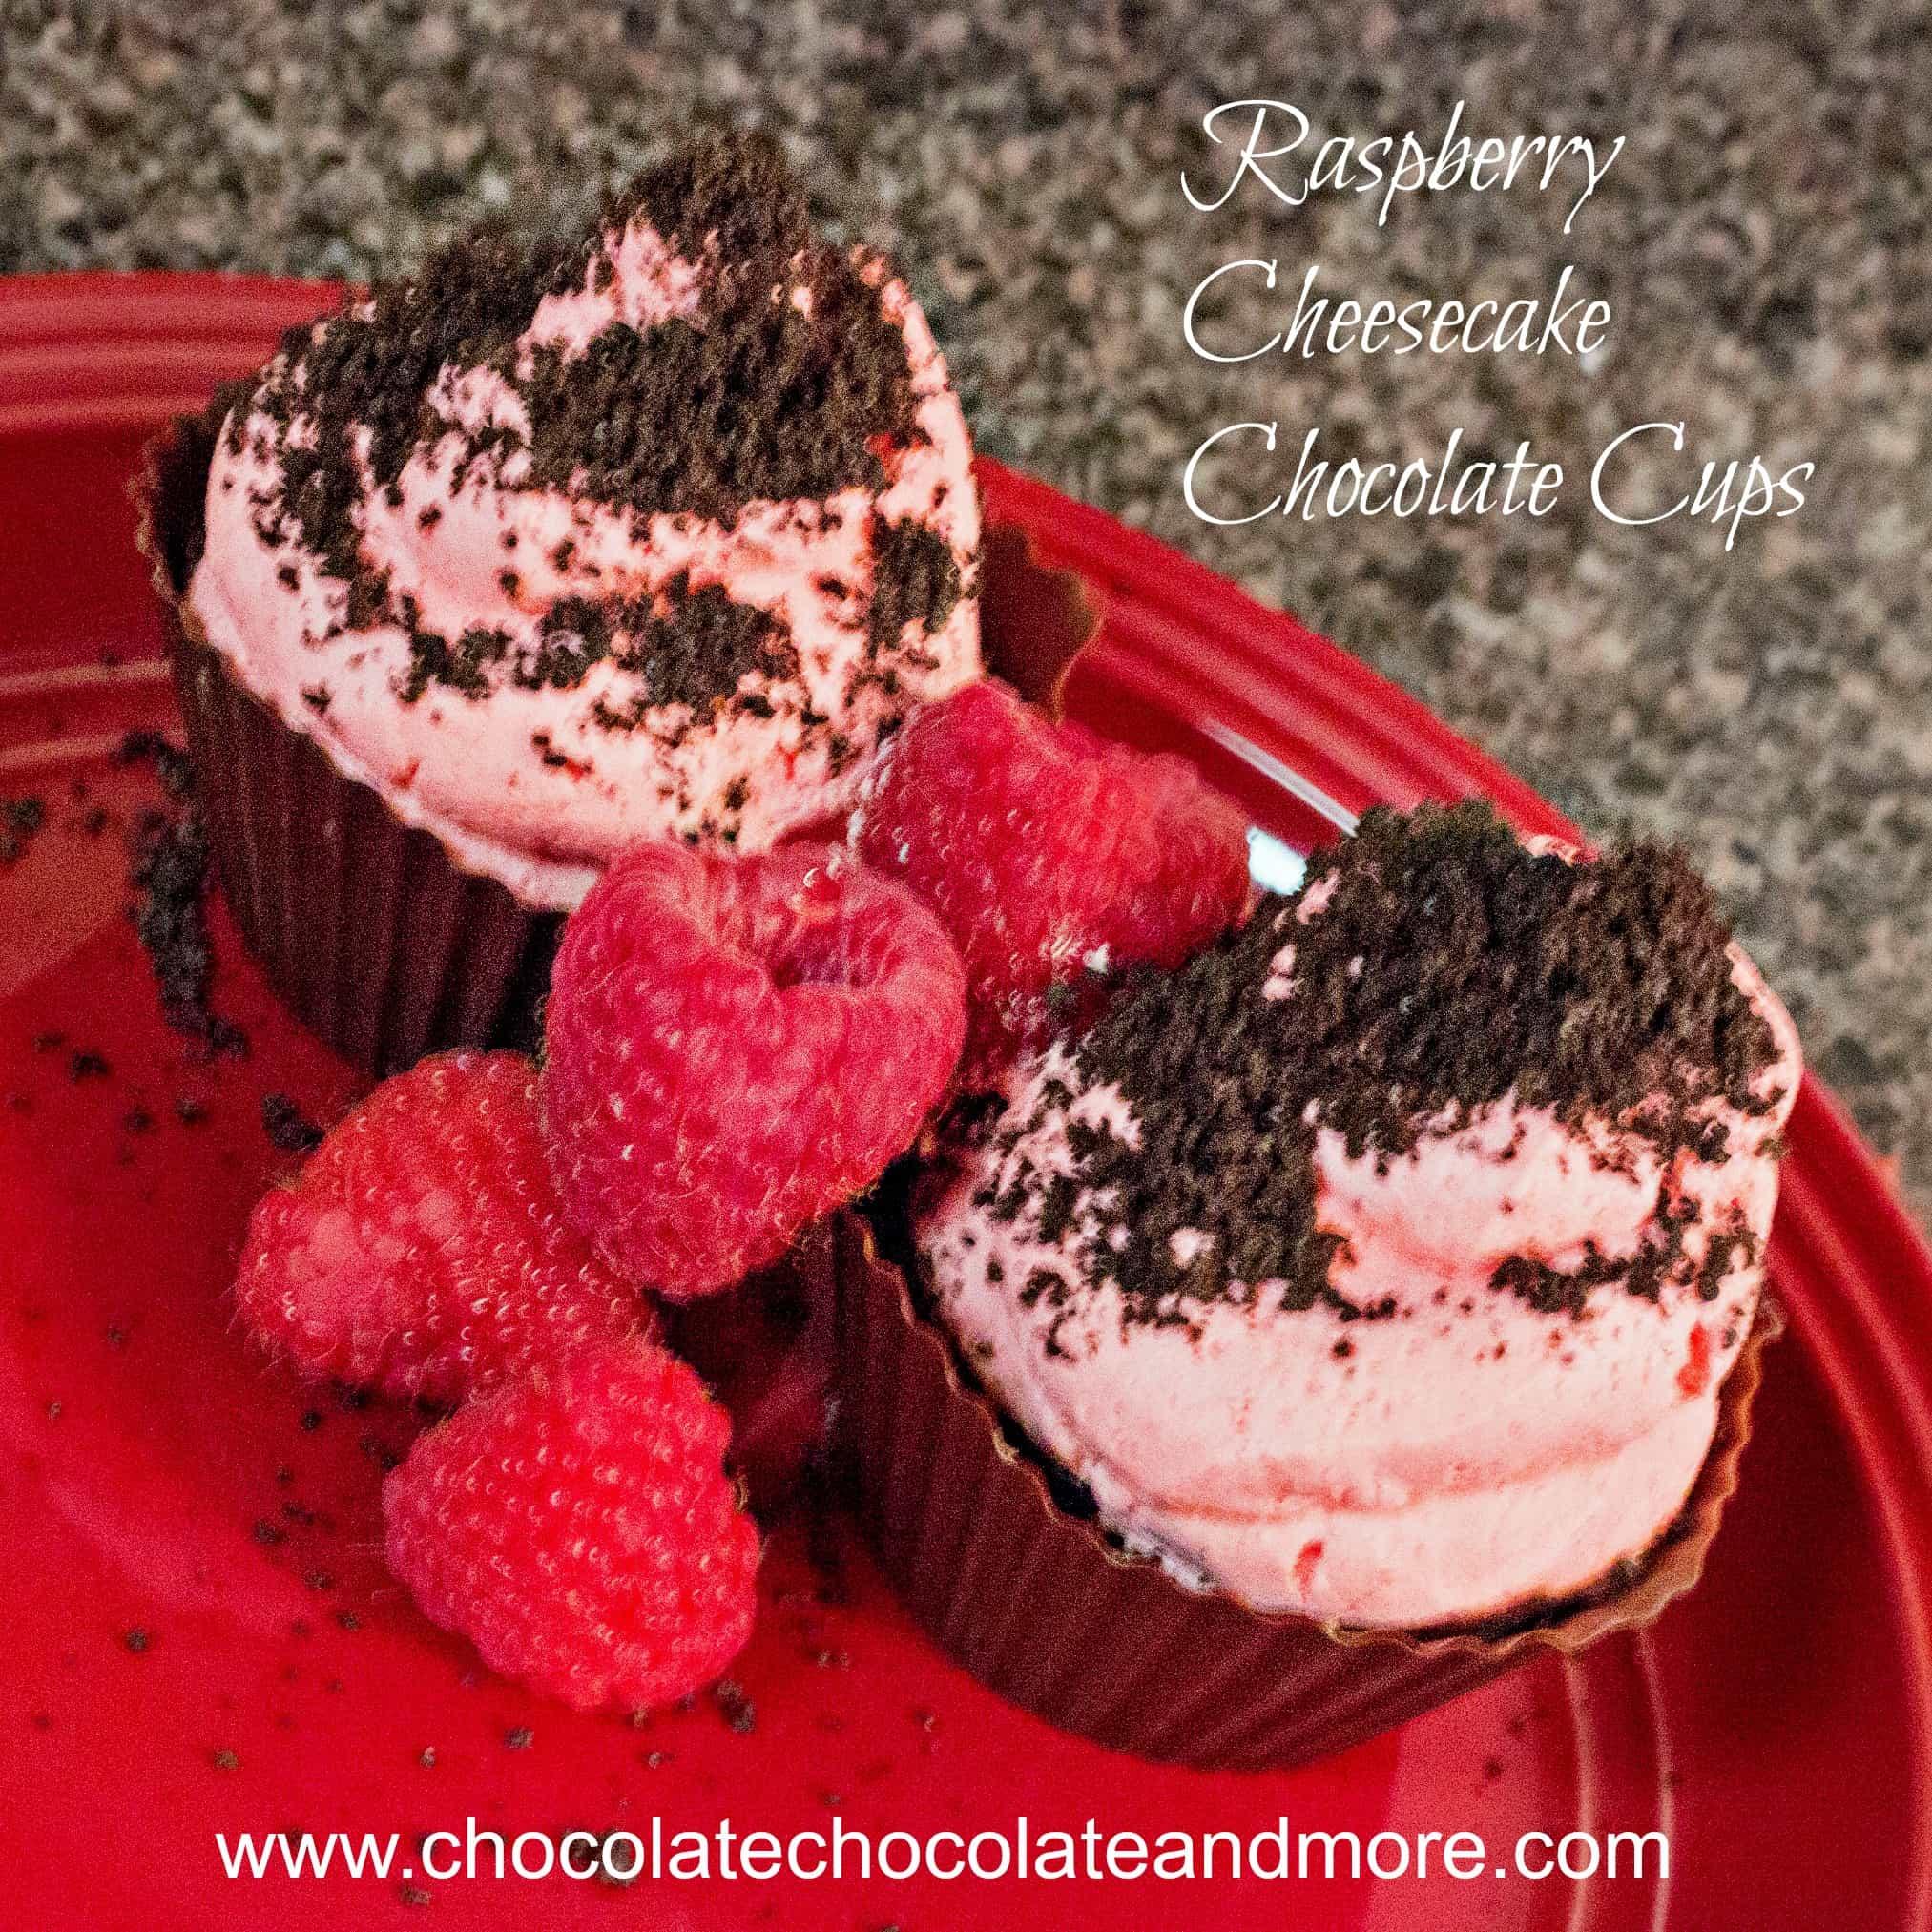 Raspberry Cheesecake Chocolate Cups